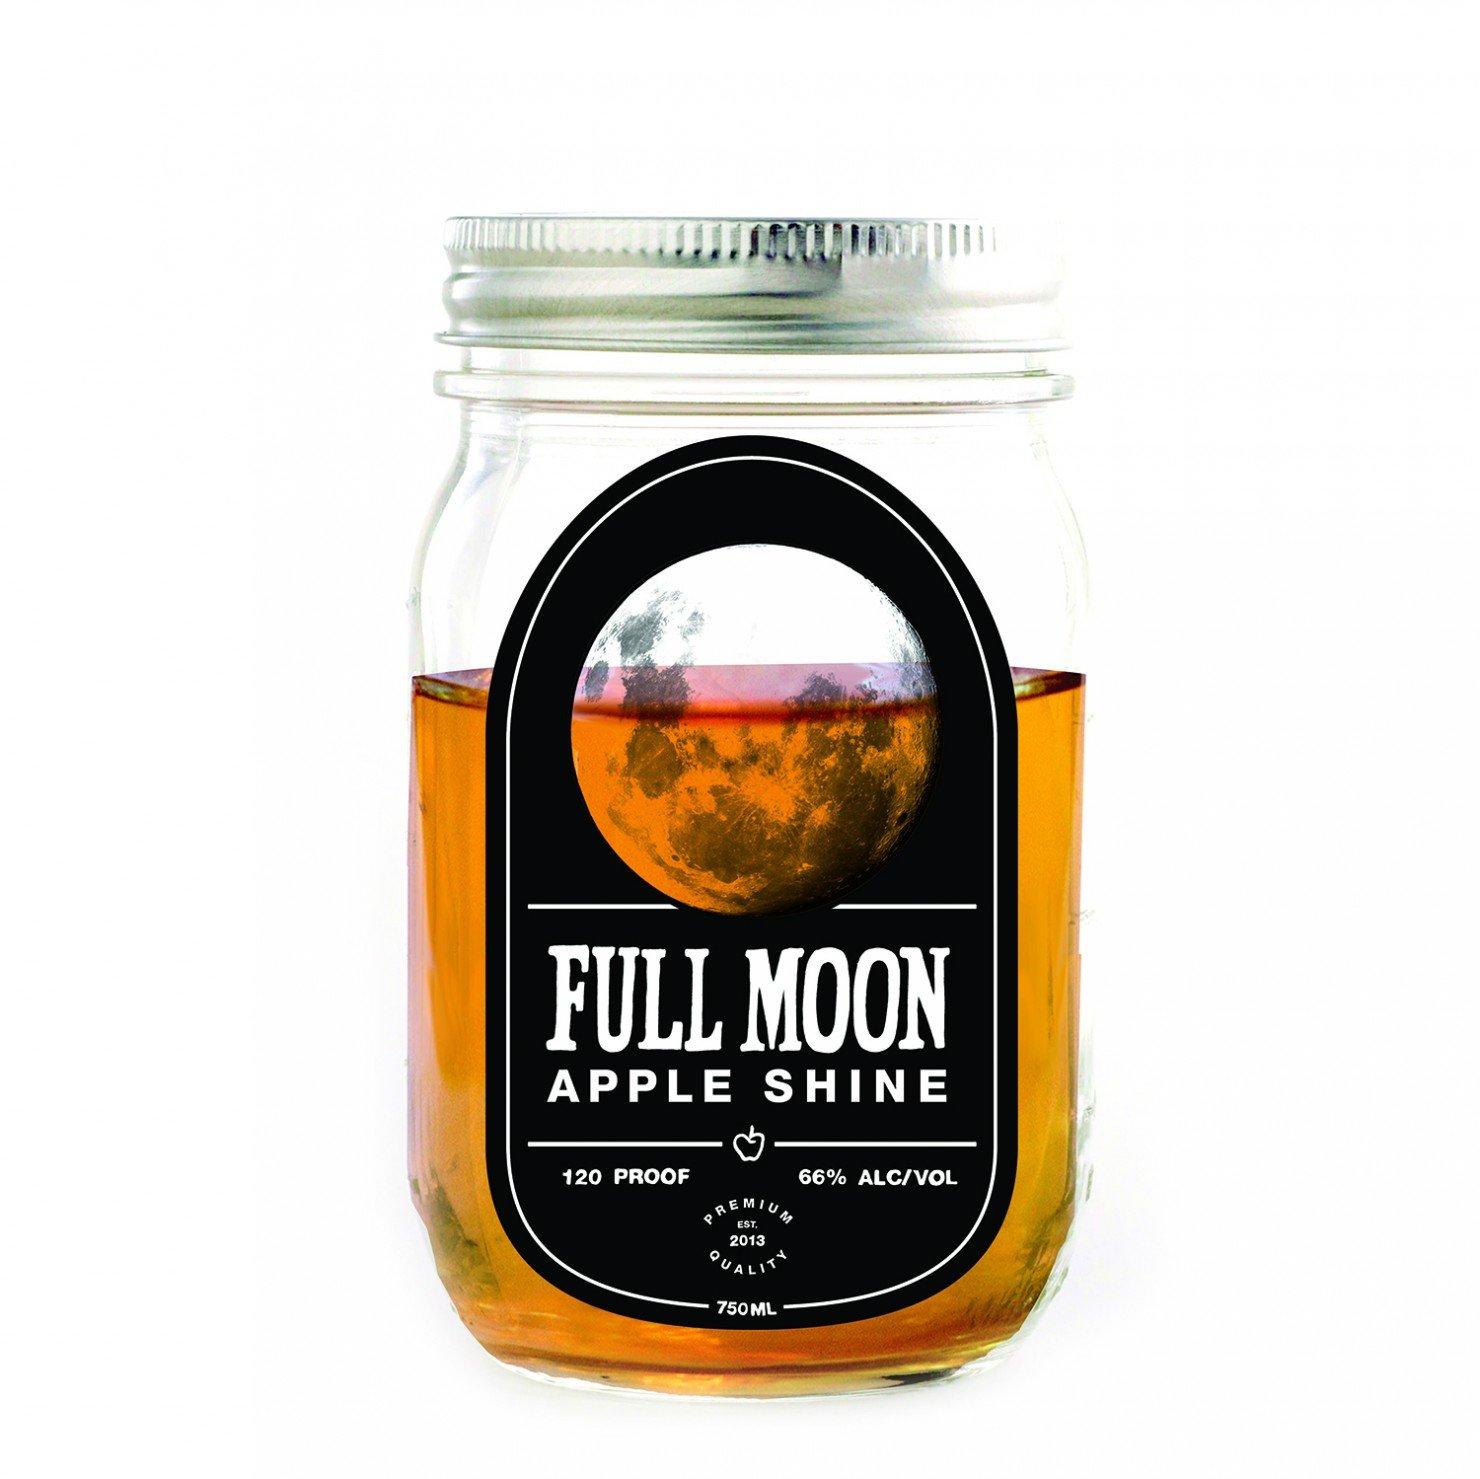 Full Moon Apple Shine 2